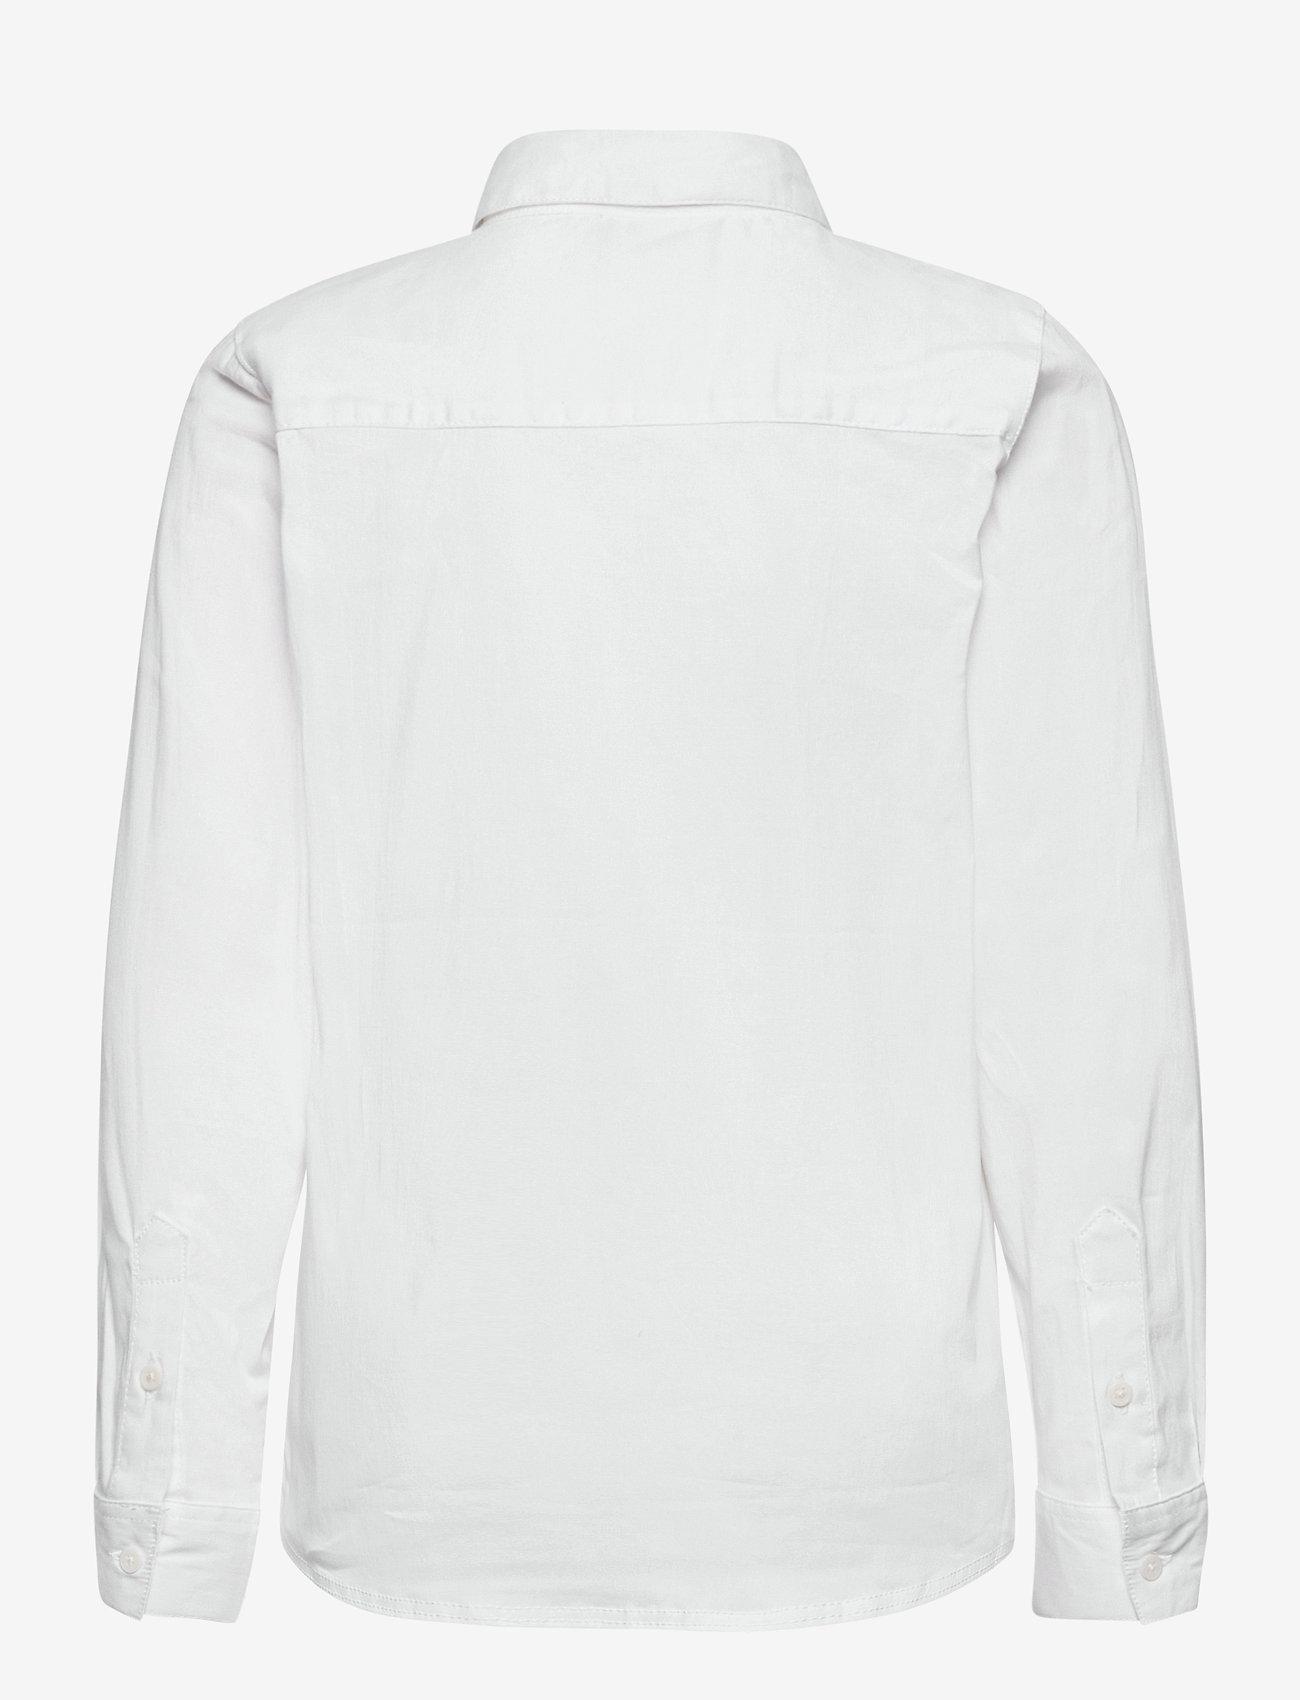 name it - NKMFRED LS SLIM SHIRT NOOS - shirts - bright white - 1